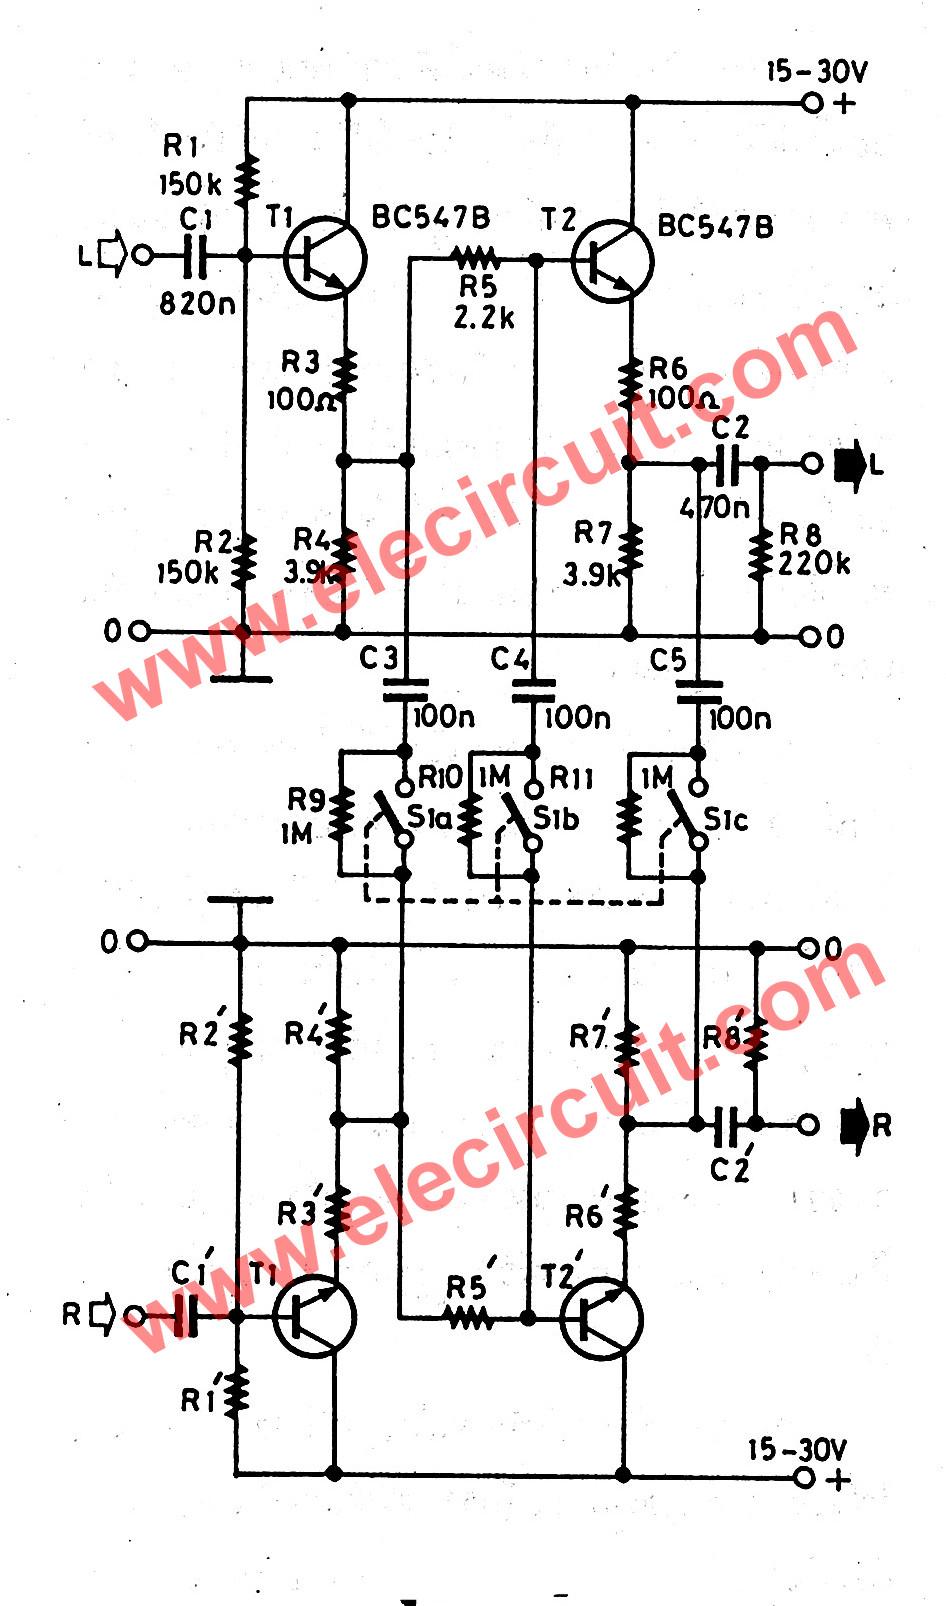 Simple audio noise filter circuit simple audio noise filter circuit for stereo system cheapraybanclubmaster Images